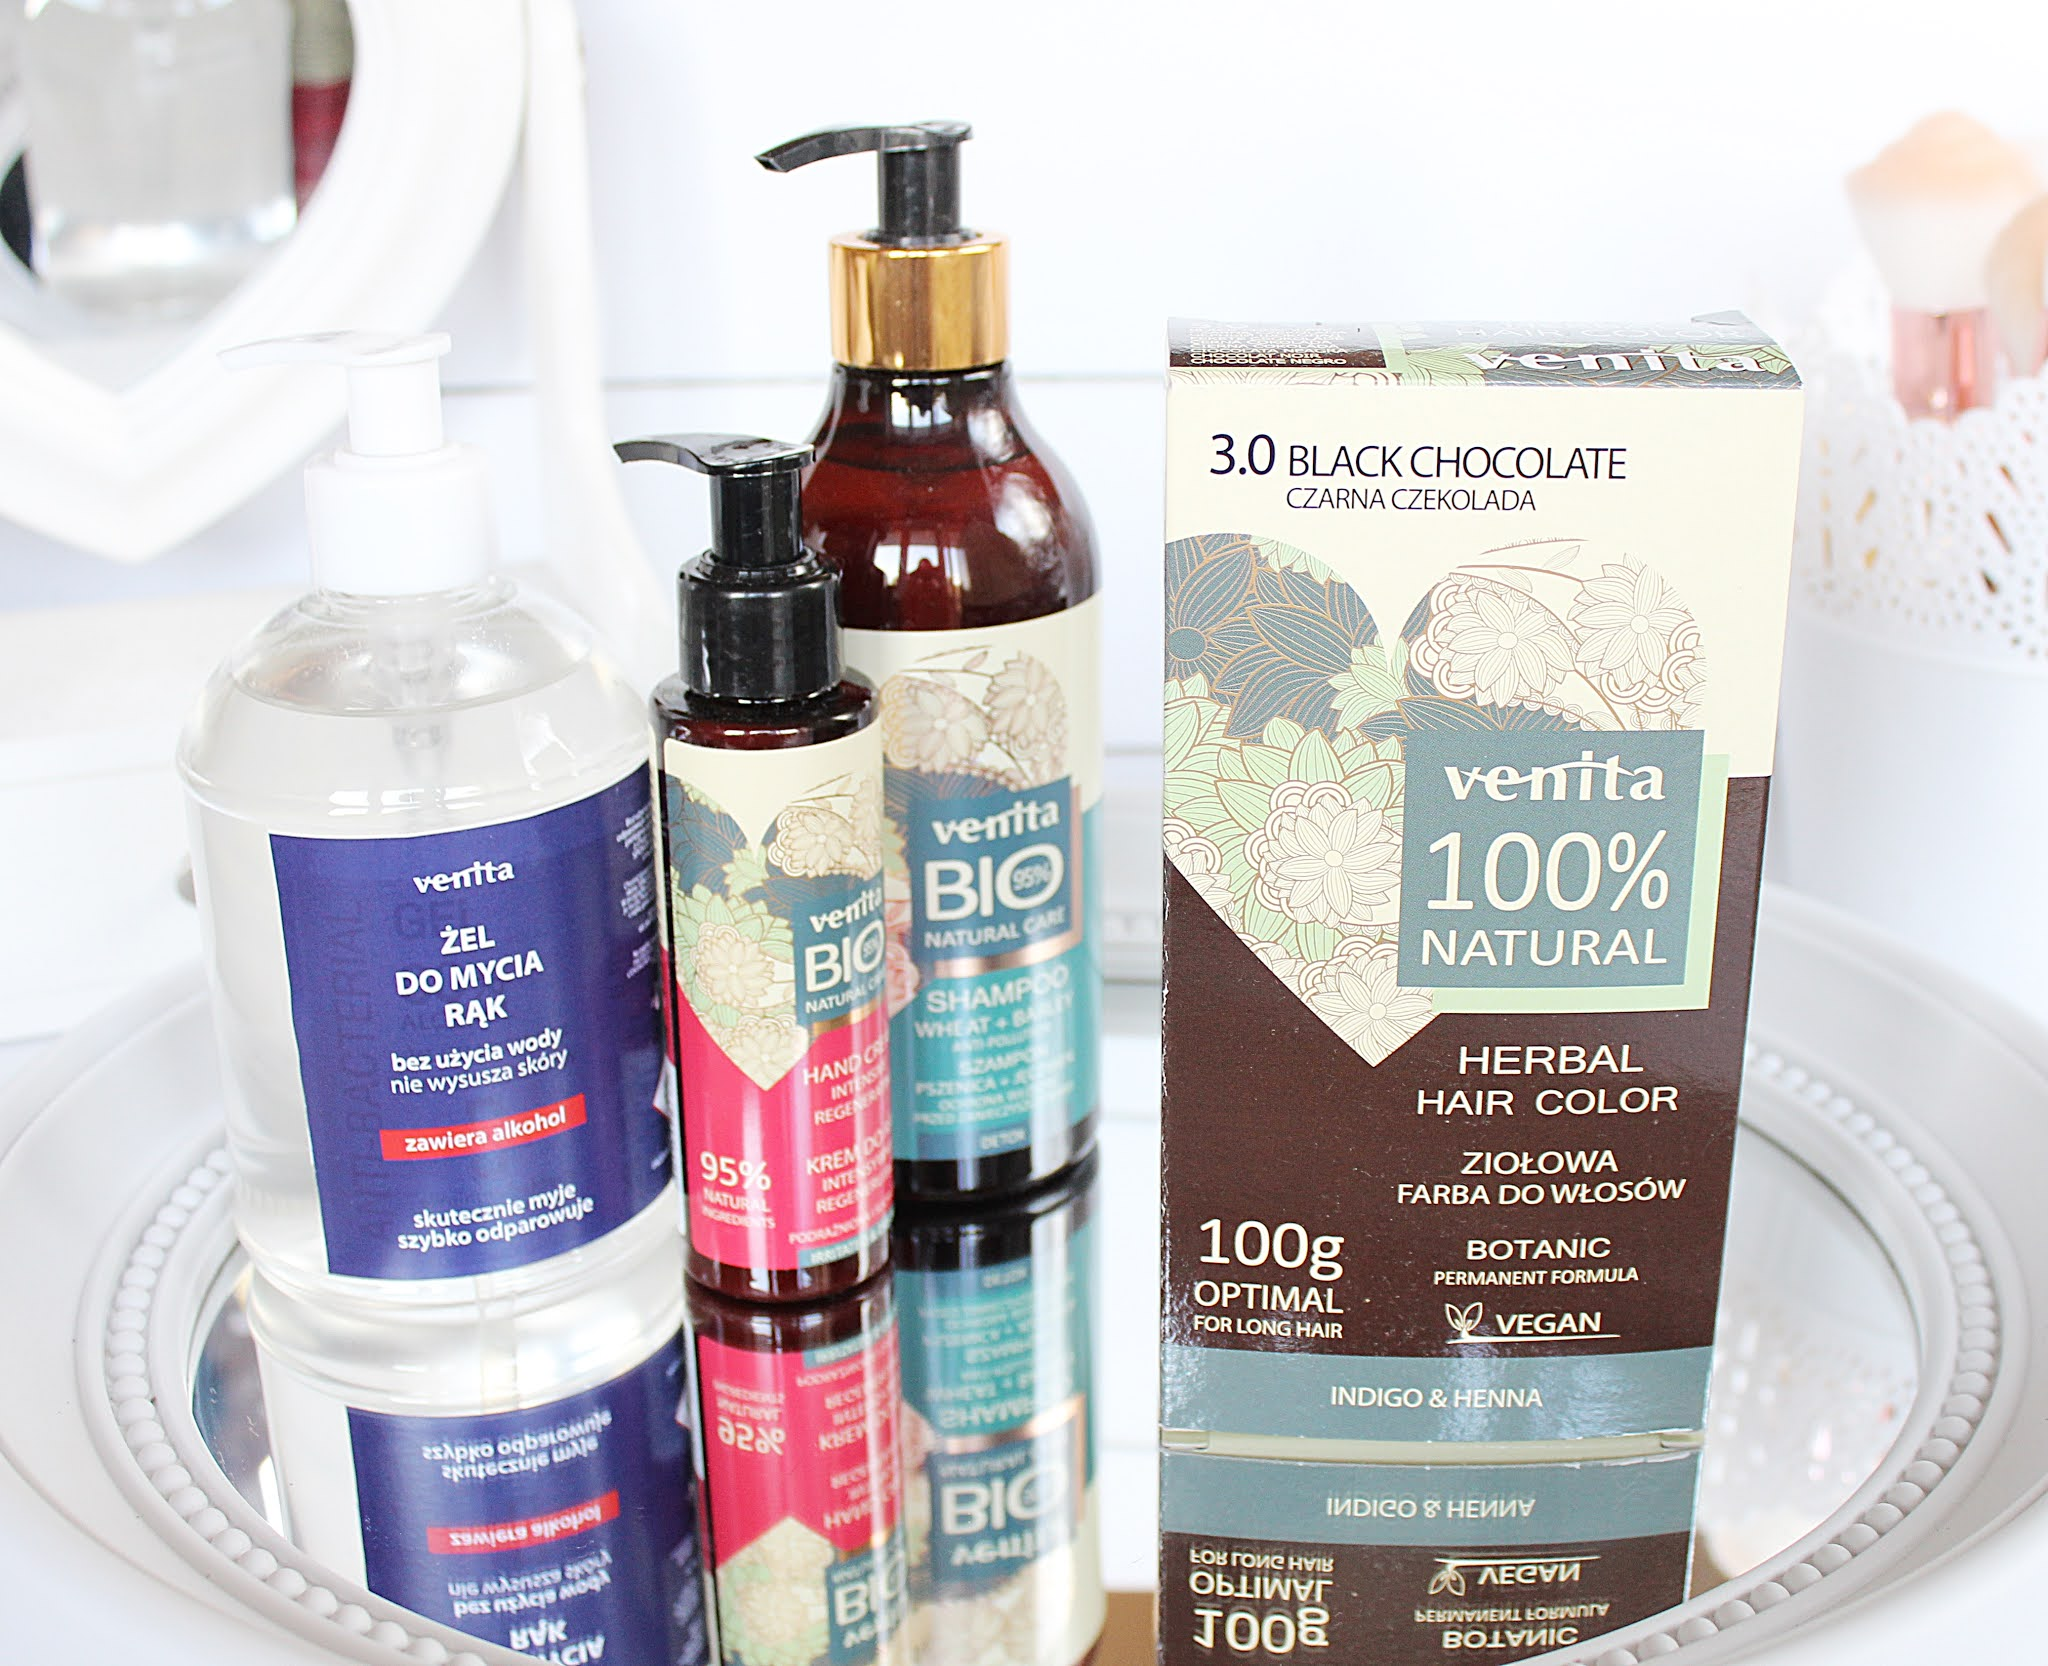 Venita farby ziołowe do włosów 100 % natural